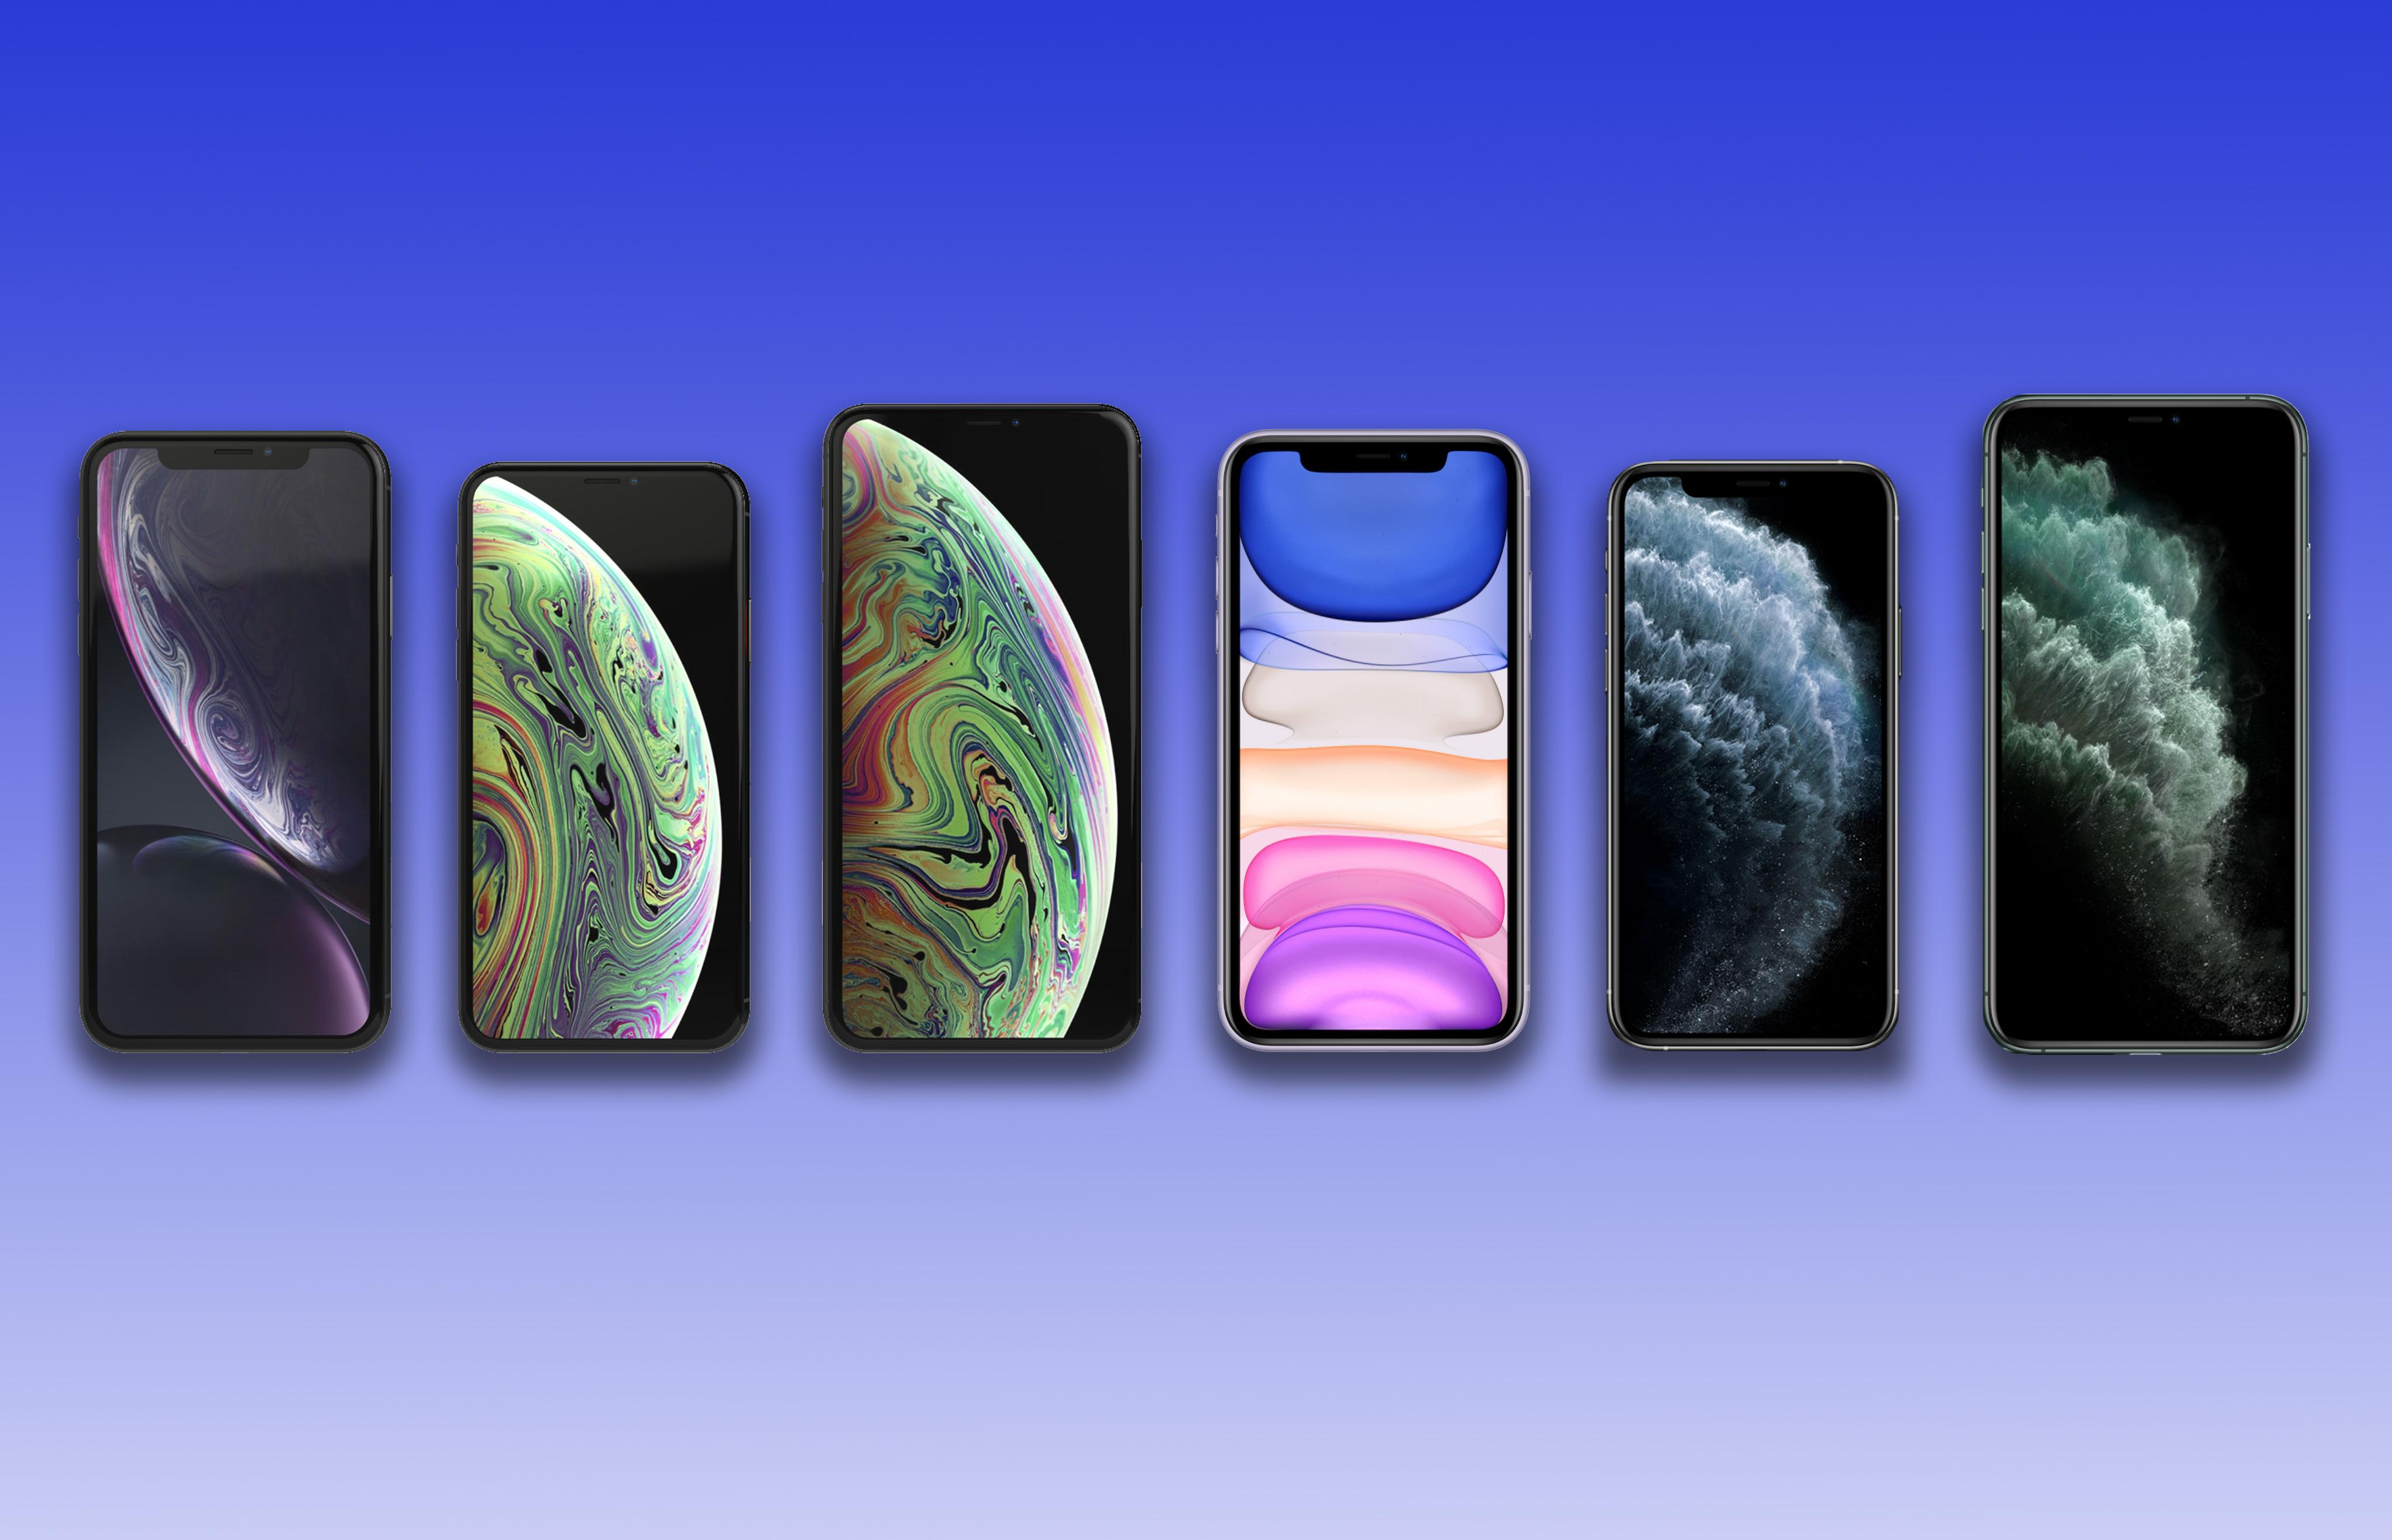 Comparing iPhone 11/Pro/Pro Max vs  iPhone XR/XS/XS Max